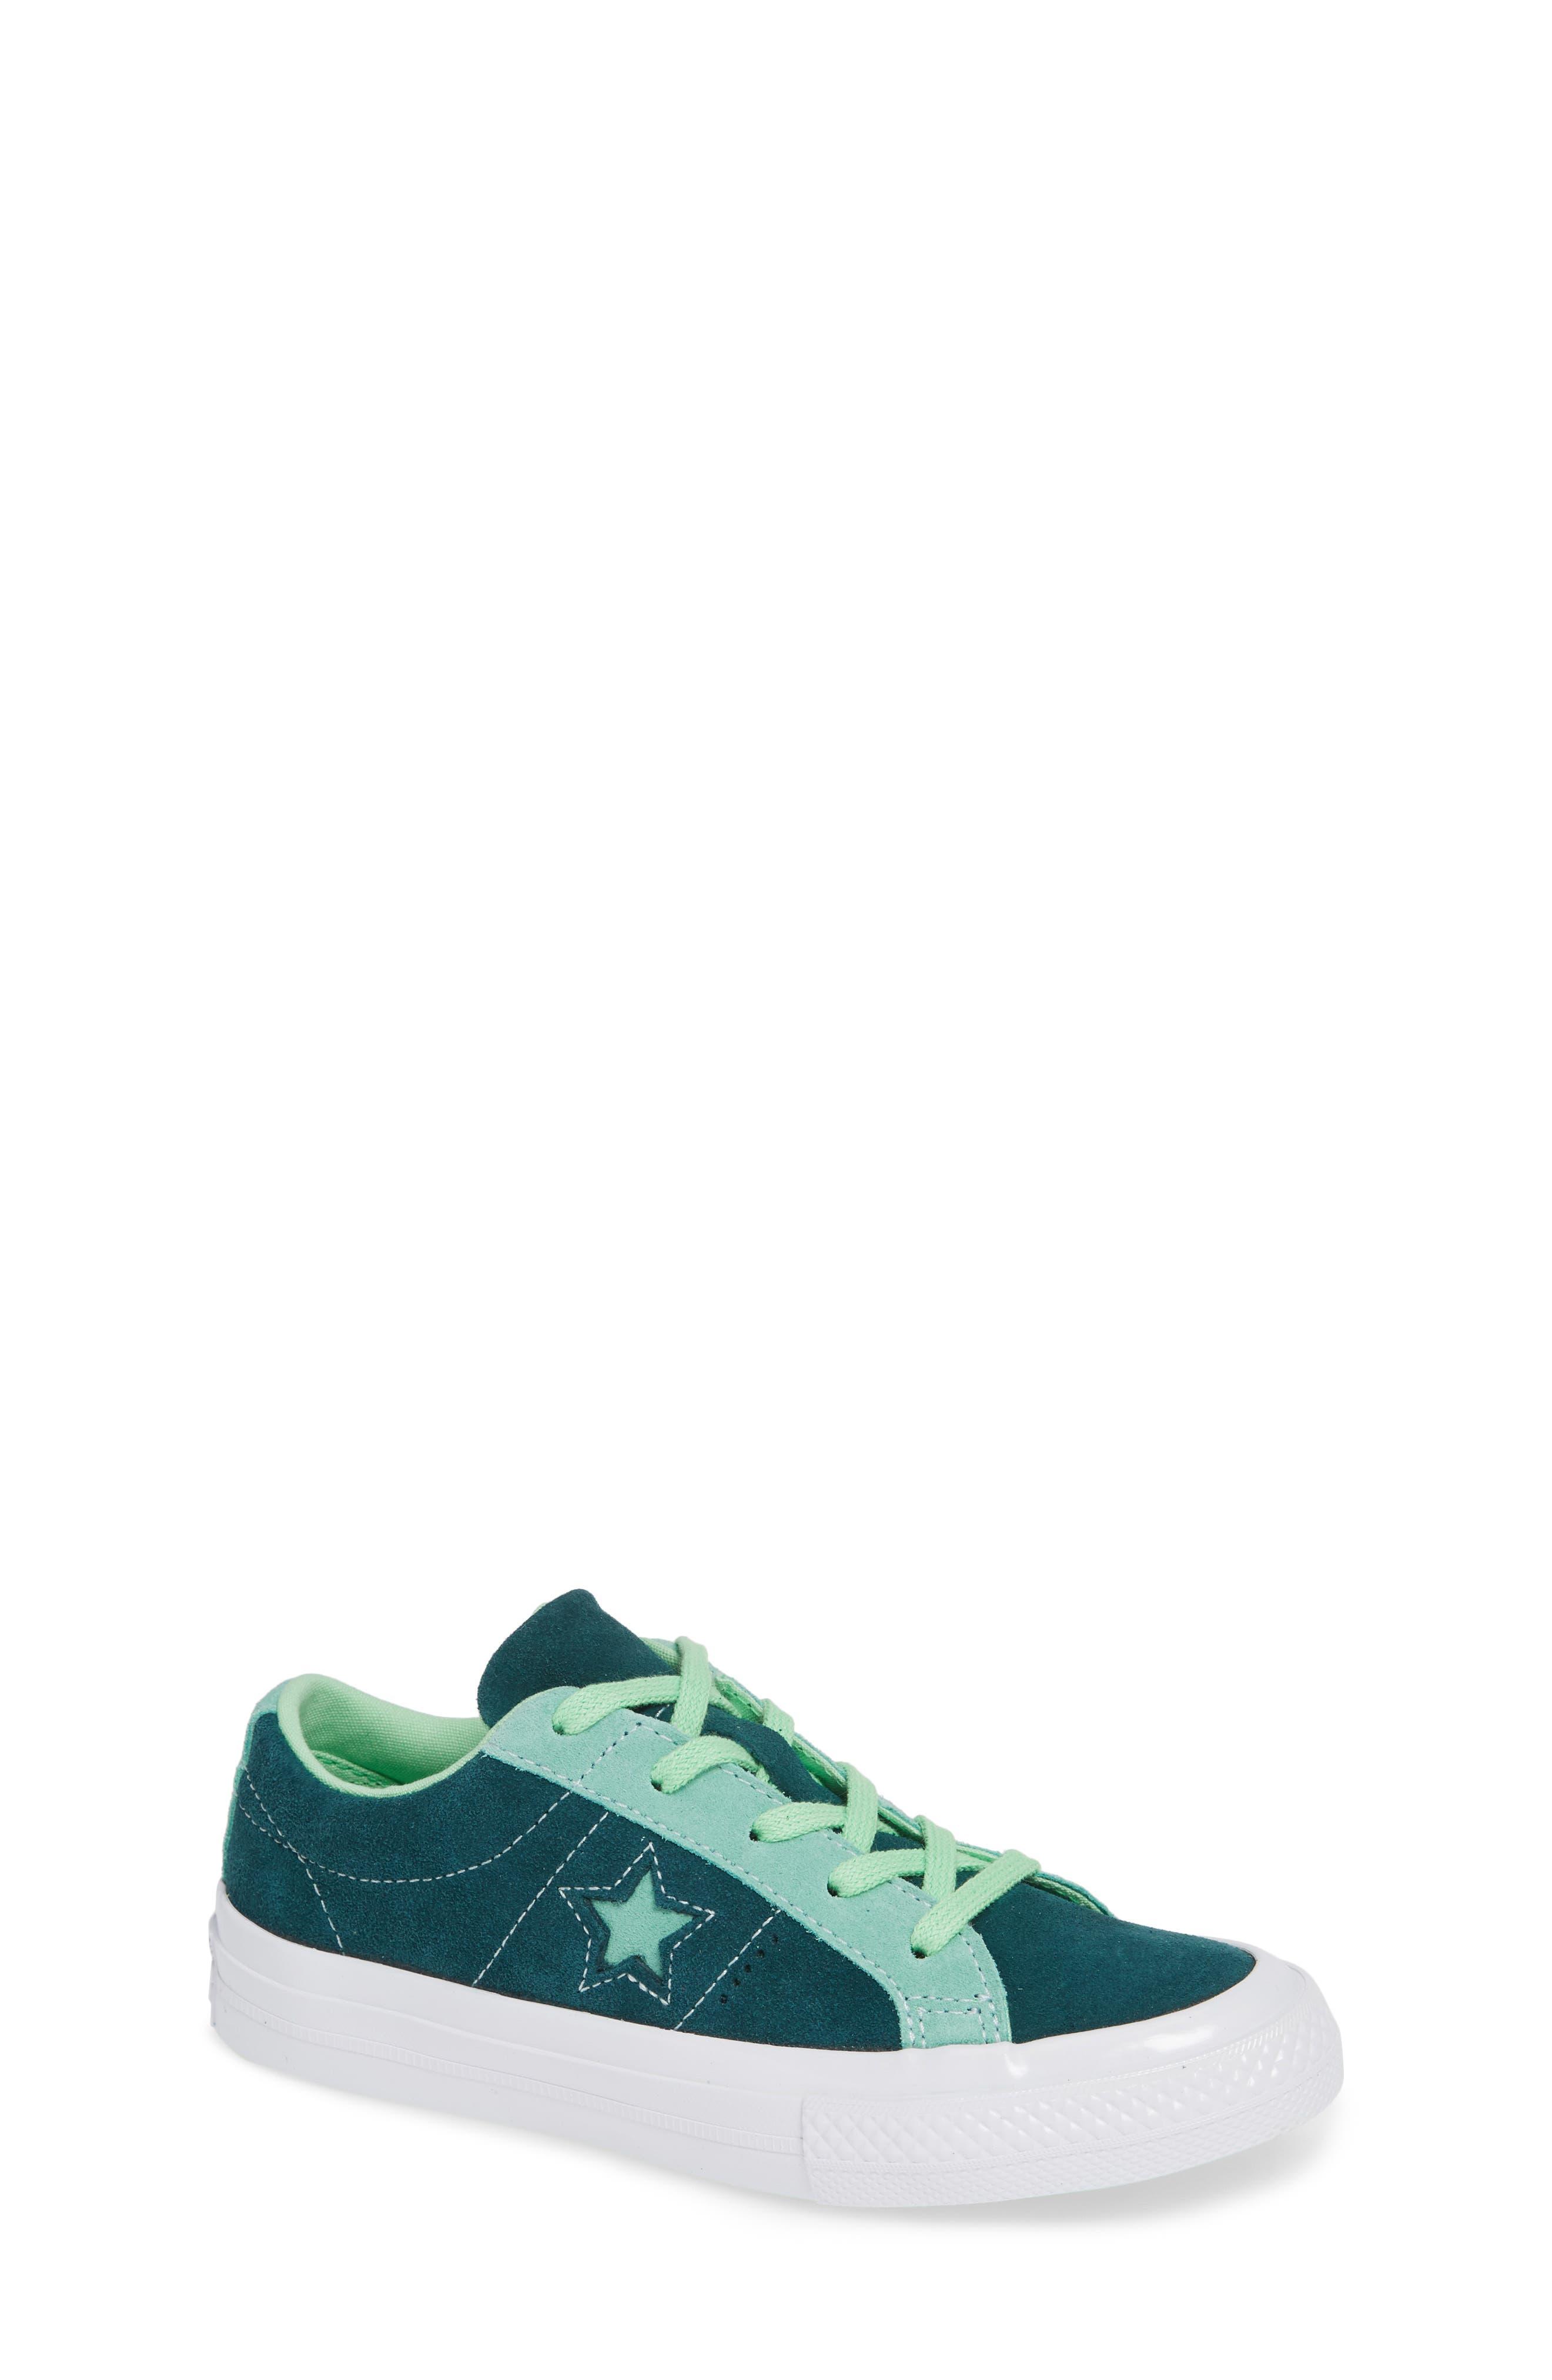 One Star Carnival Low Top Sneaker,                             Main thumbnail 1, color,                             345